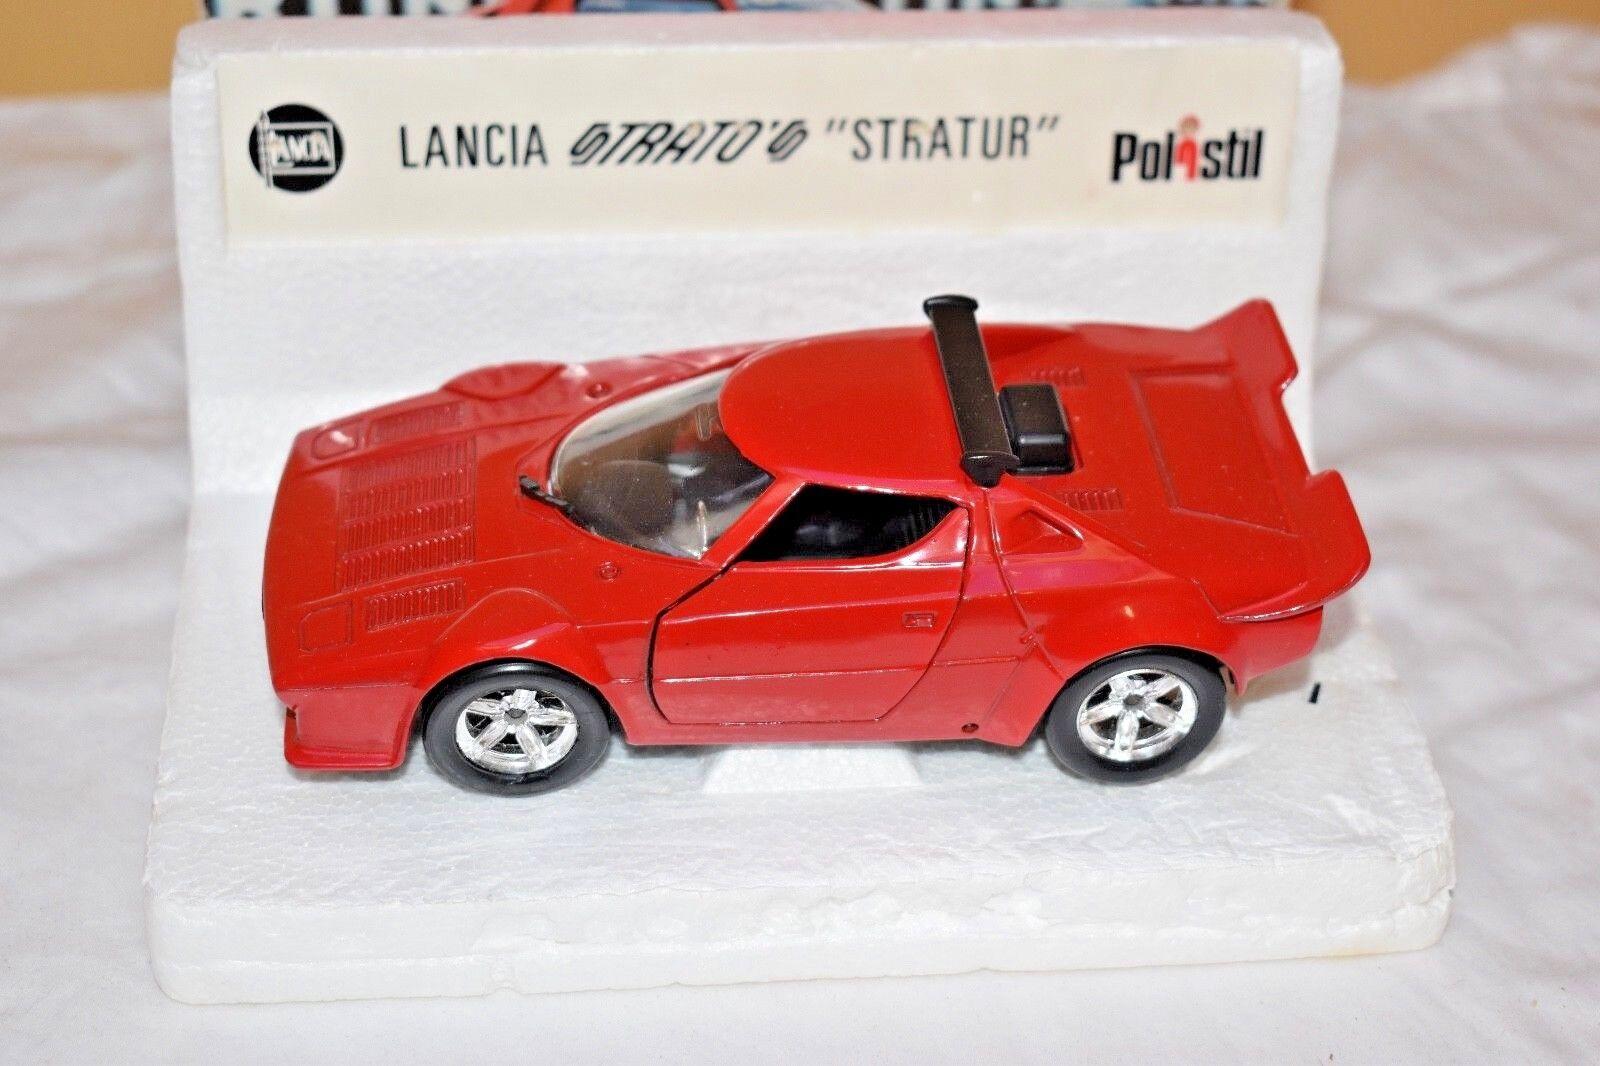 Polisti Lancia Stratur Die Cast; S32; Excellent Model Condition. Original Box